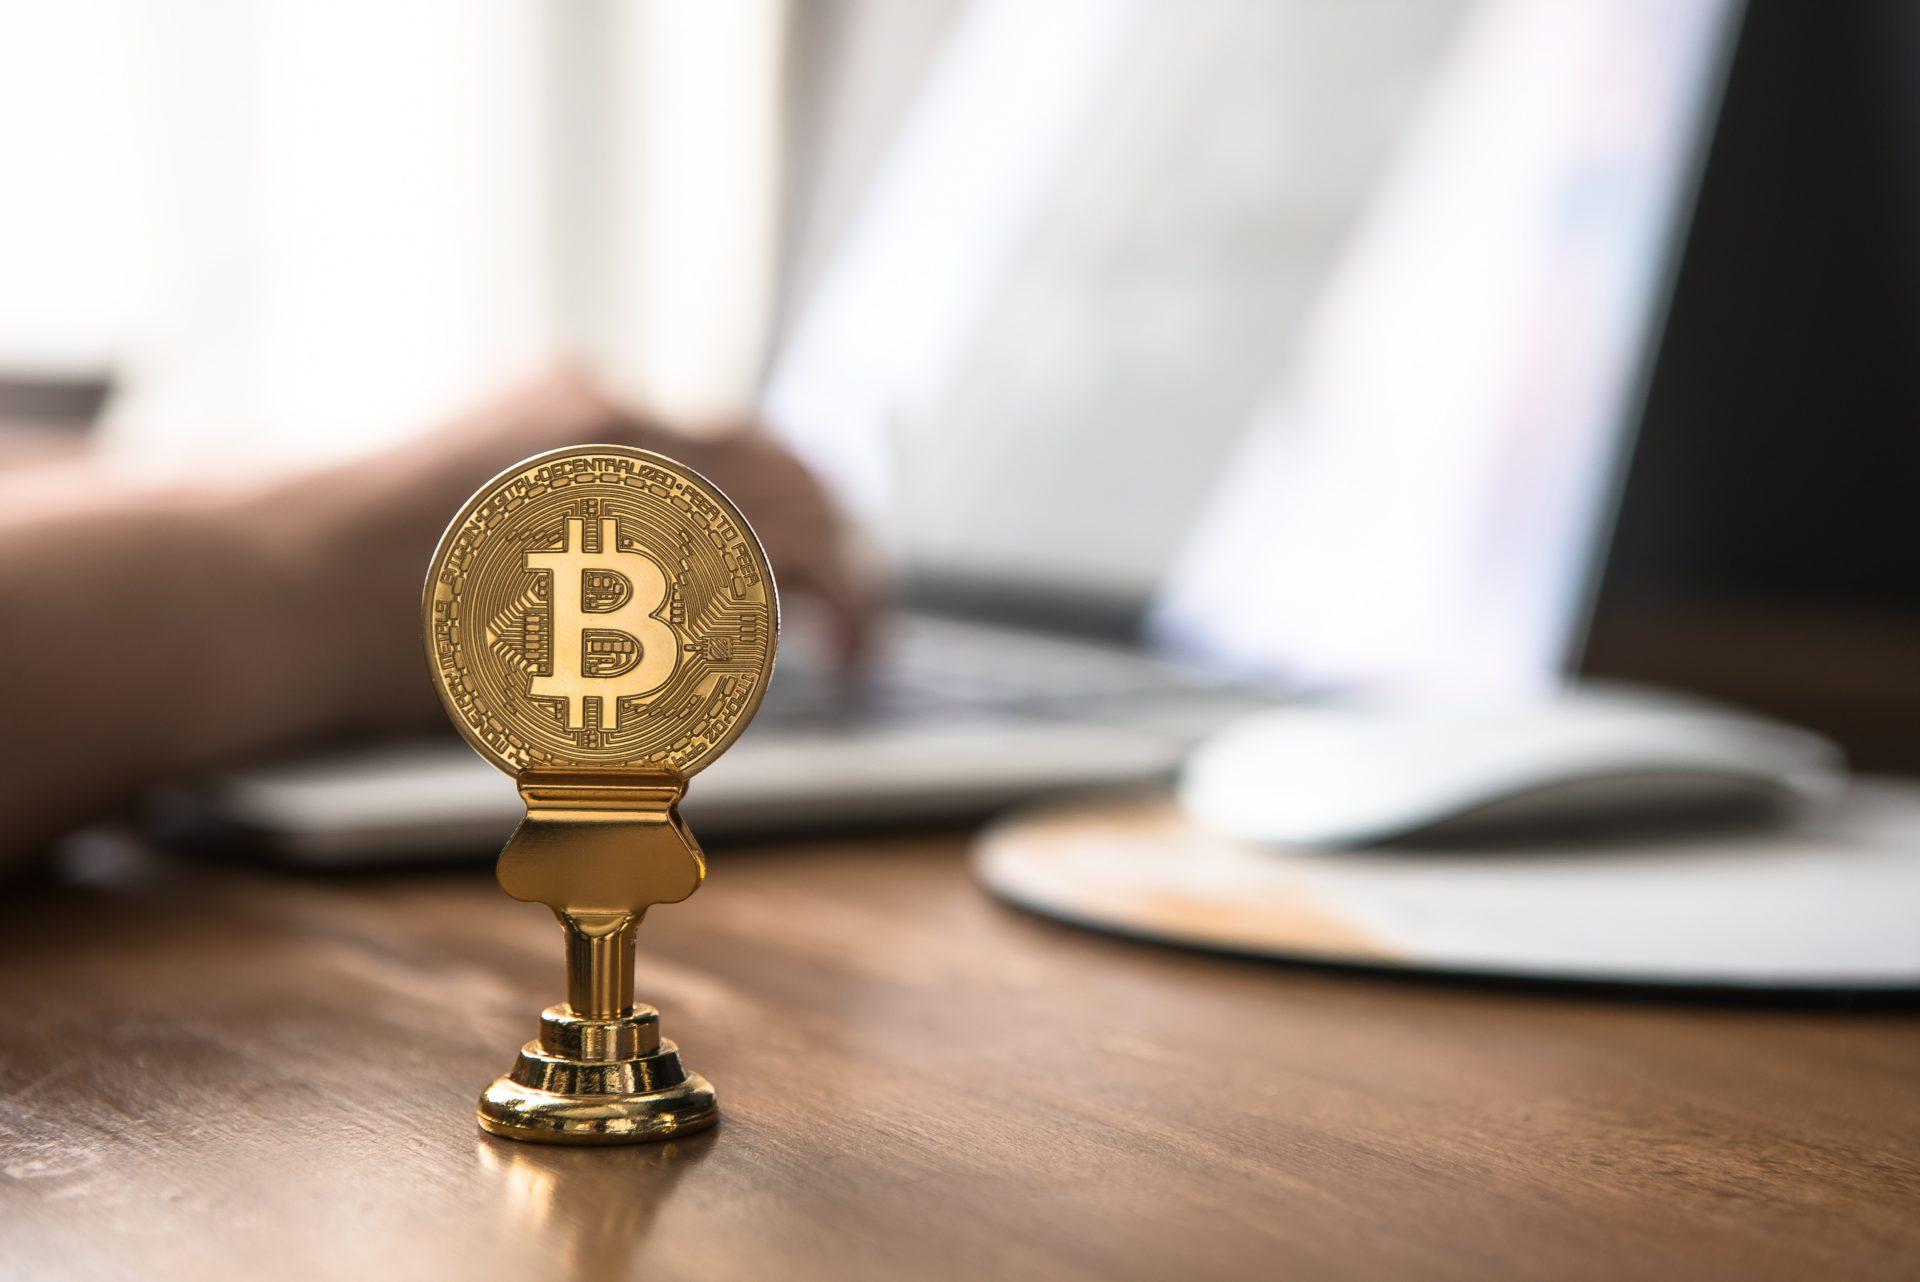 Bitcoin Remains Range-Bound At $7,000, Analysts Bearish 13